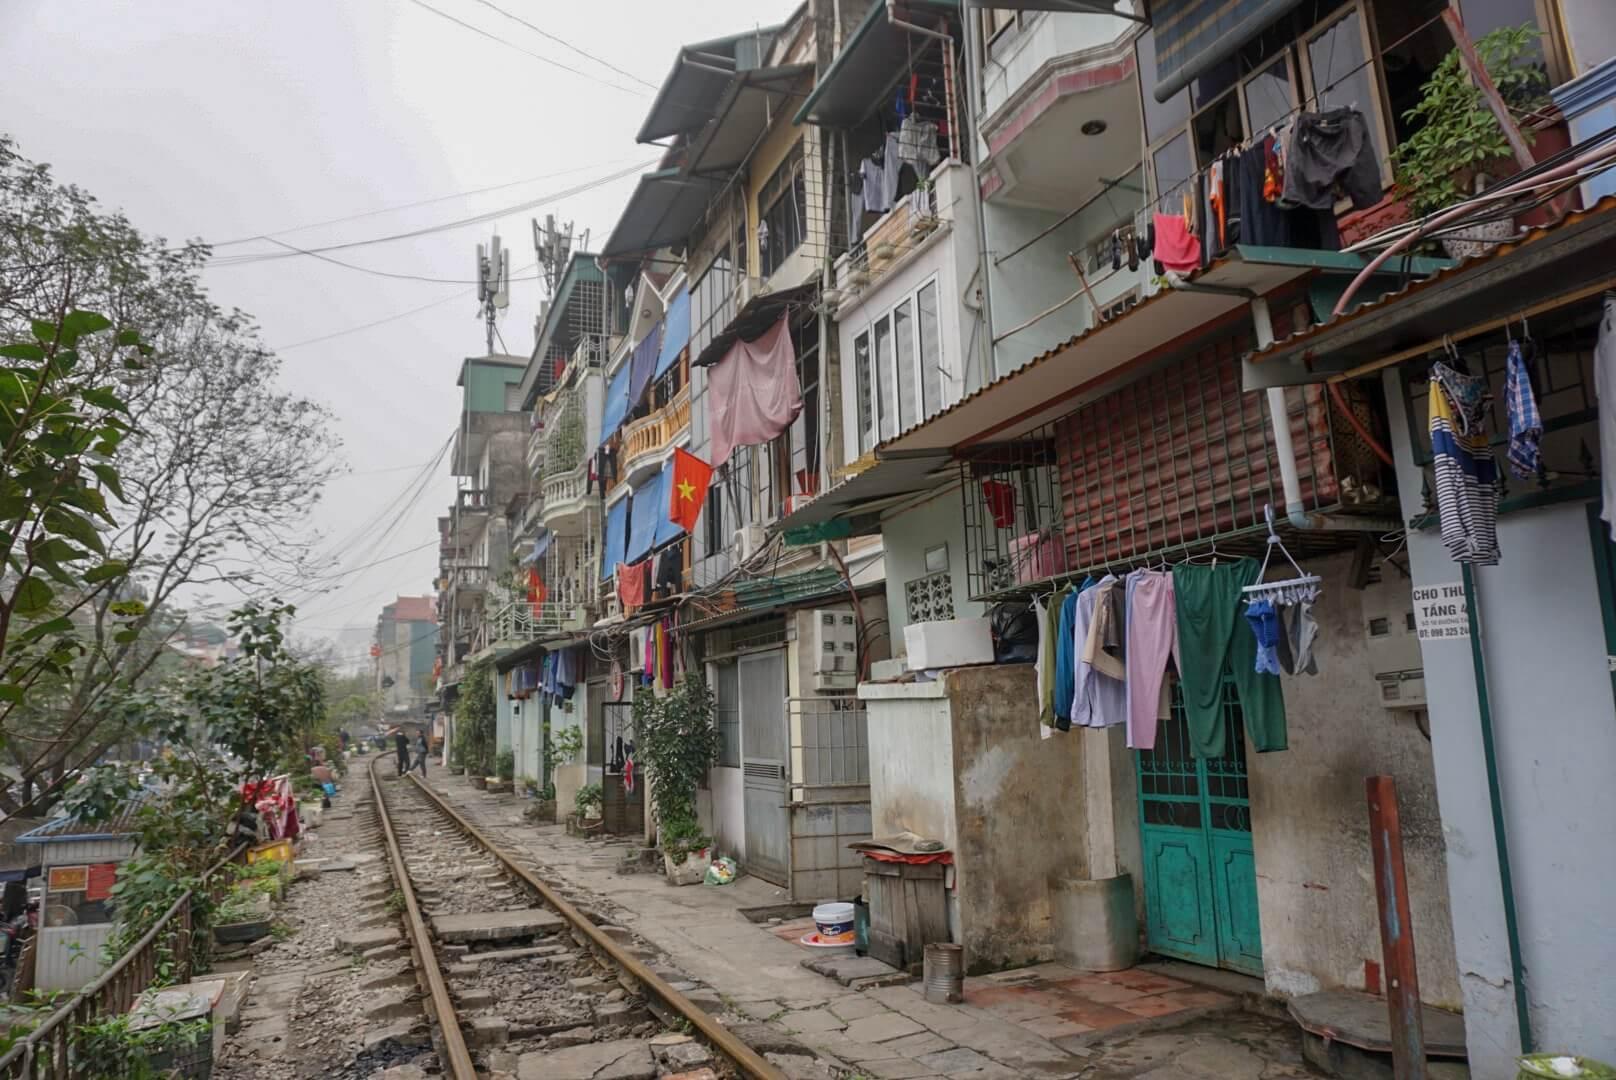 Voie ferrée rue Hanoi Vietnam